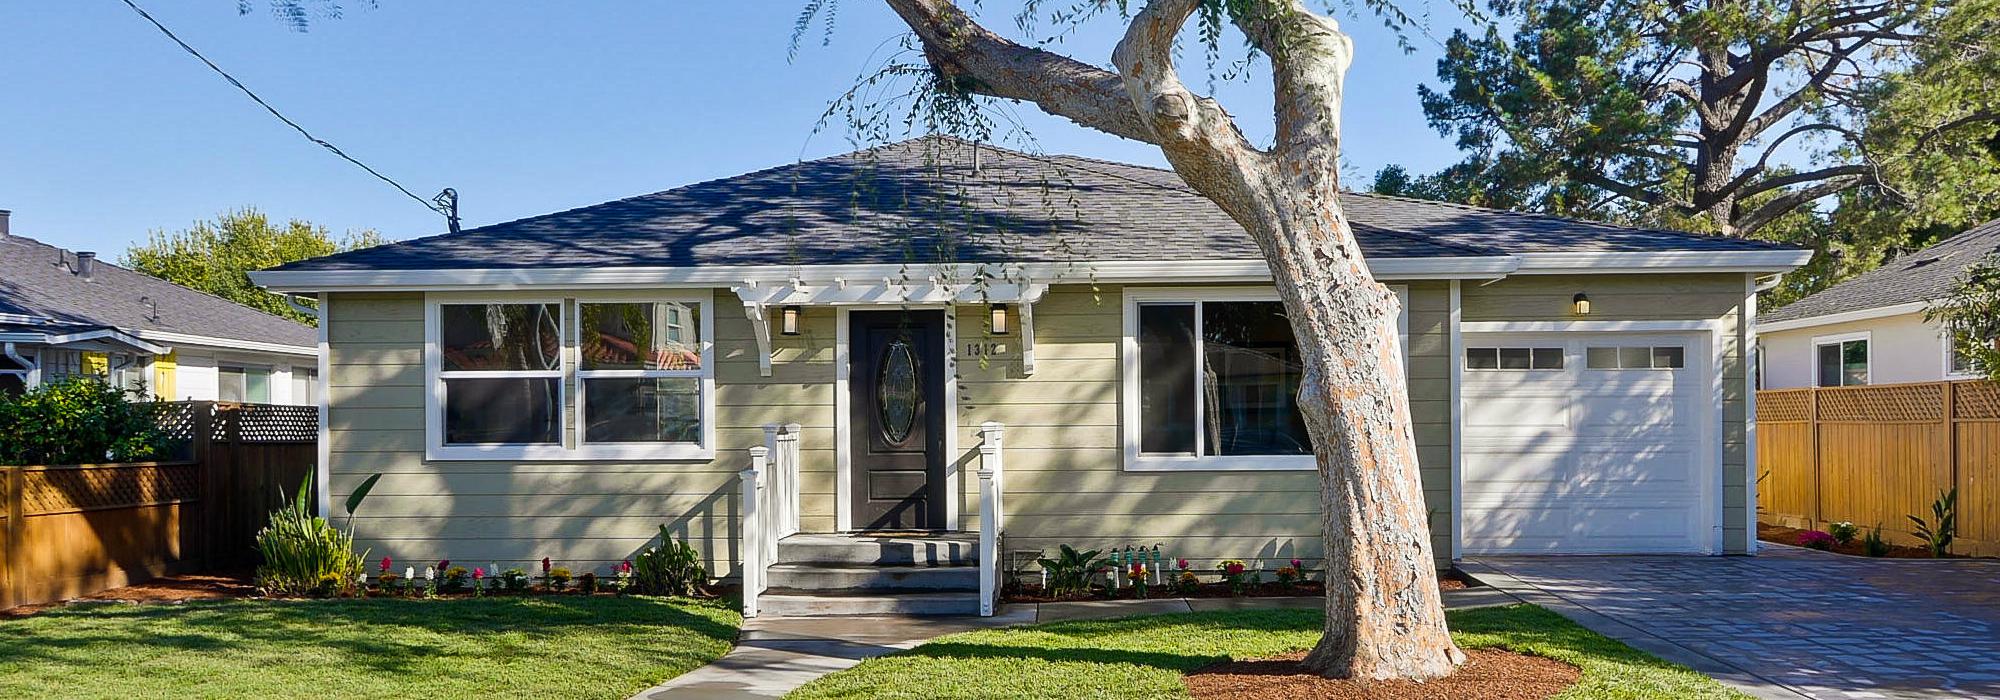 1312 Selo Drive, Sunnyvale, CA 94086